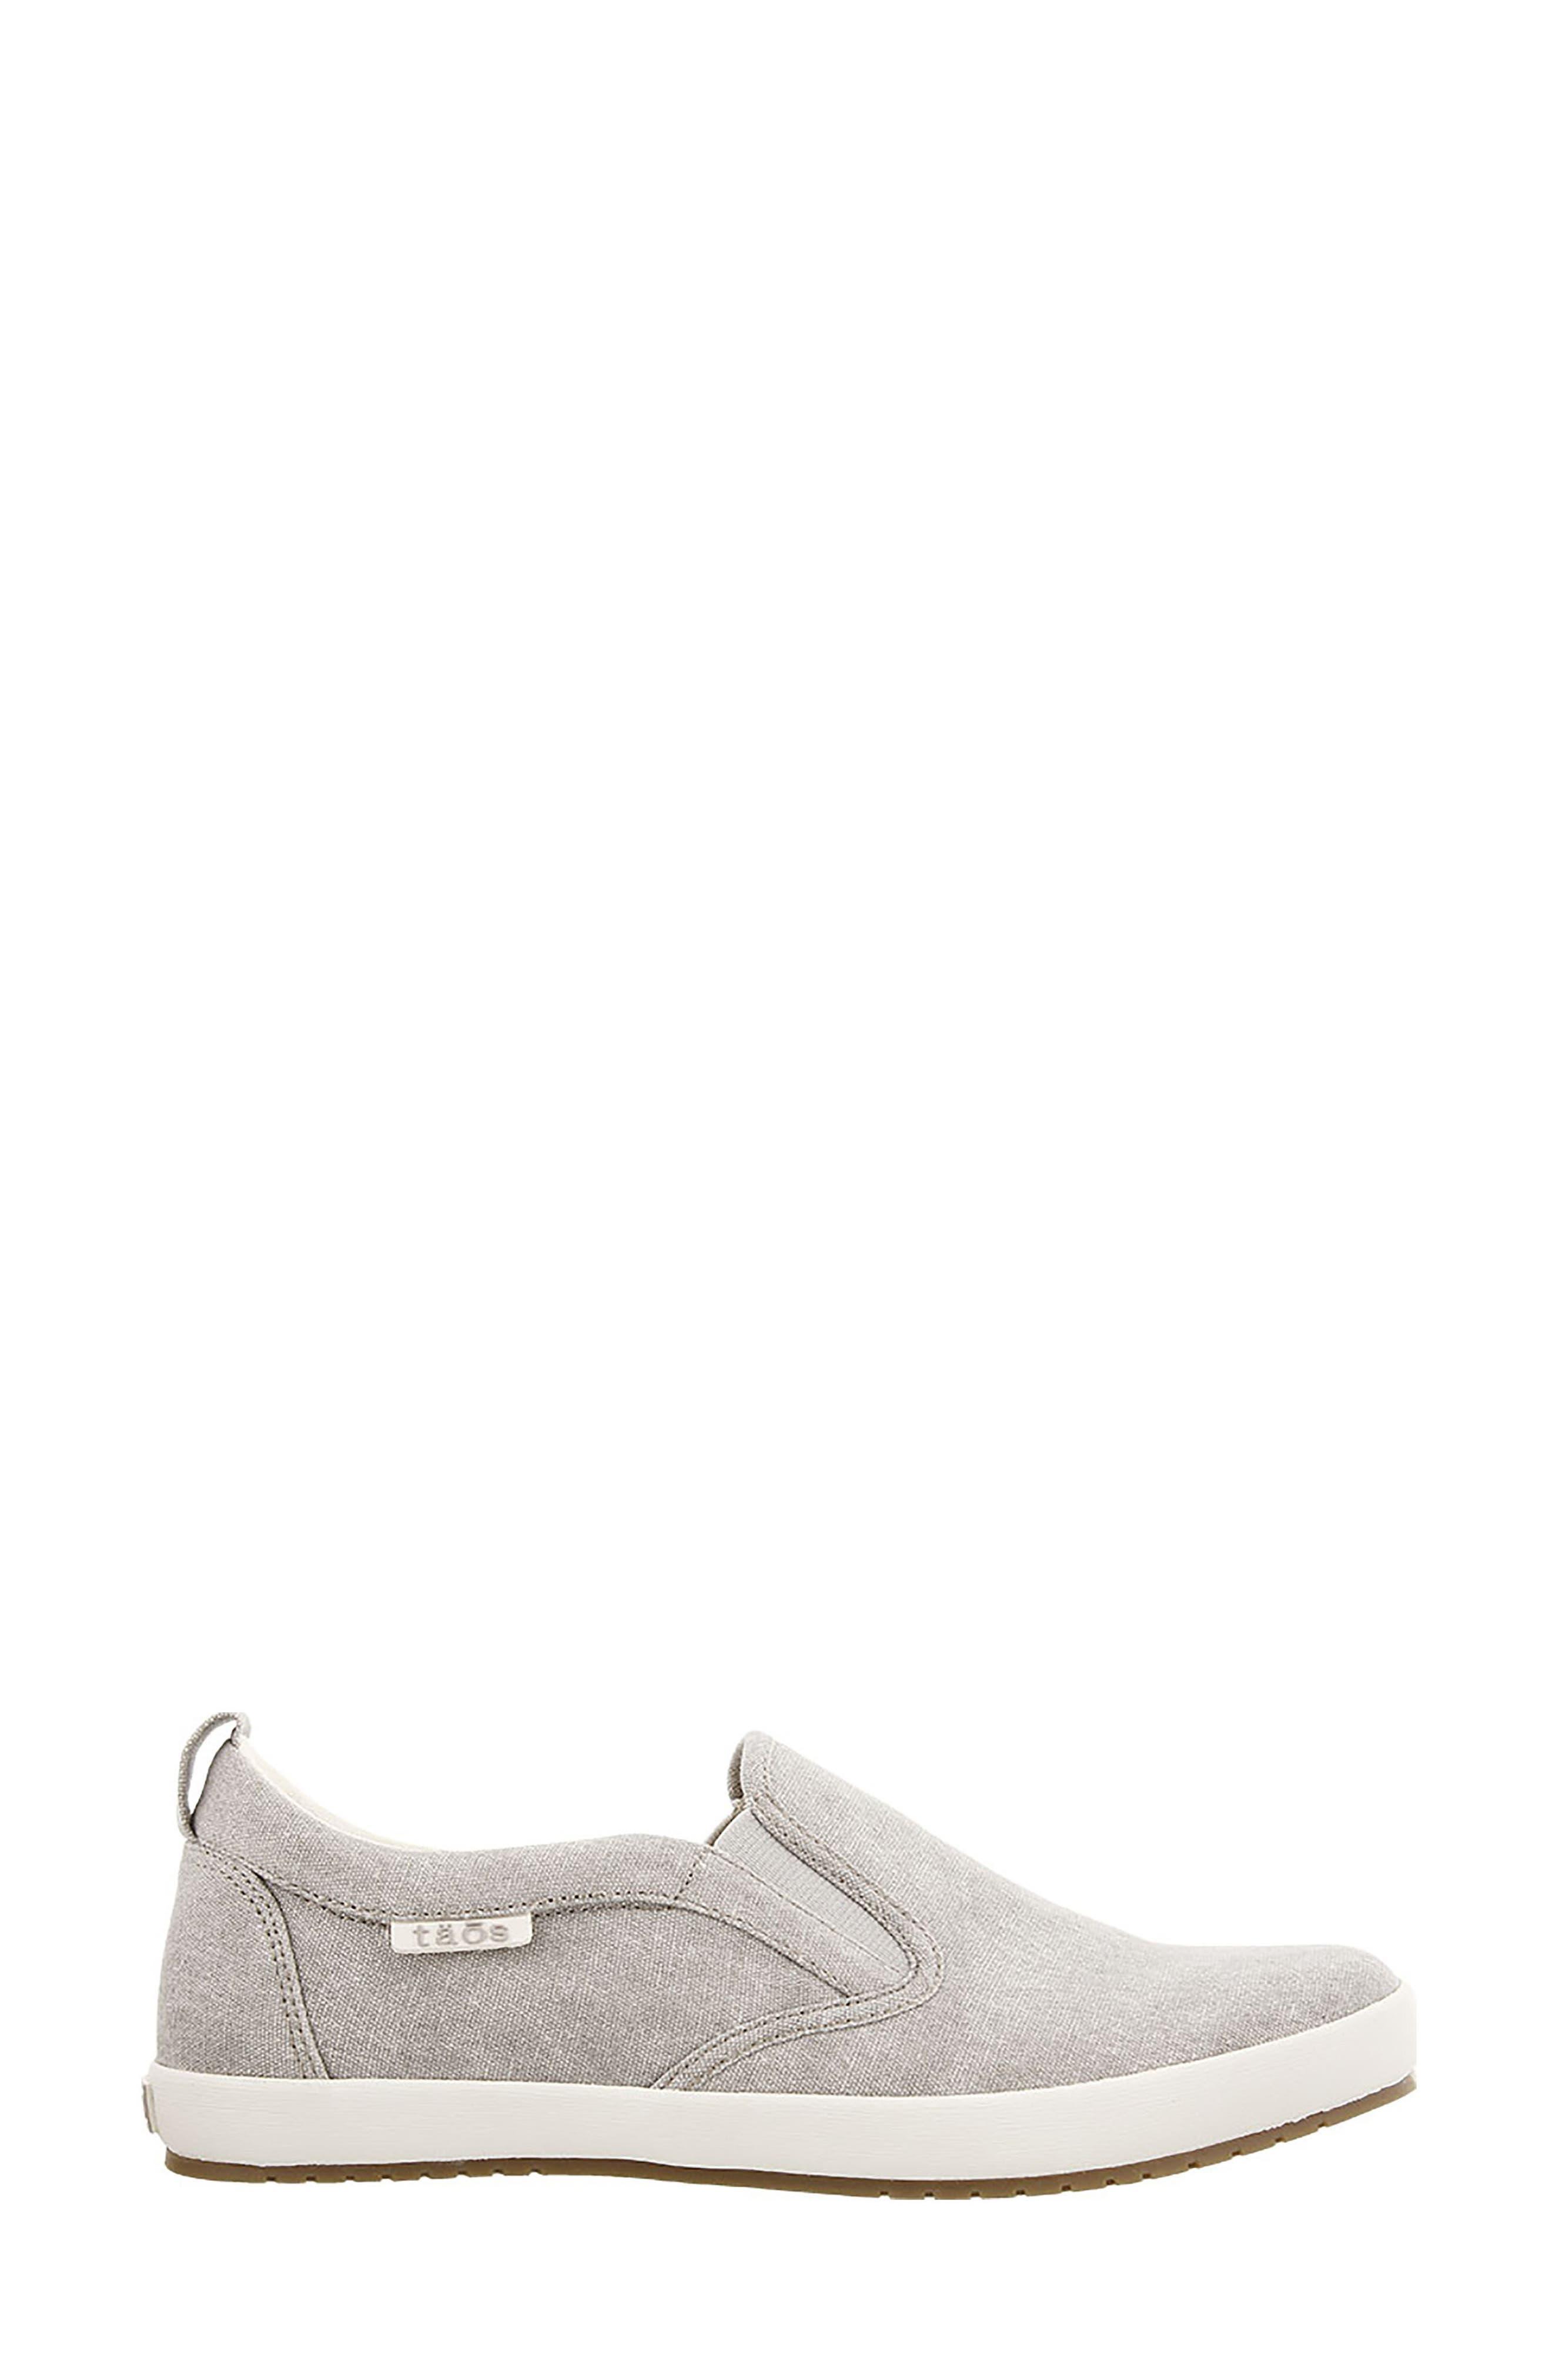 Alternate Image 3  - Taos Dandy Slip-On Sneaker (Women)